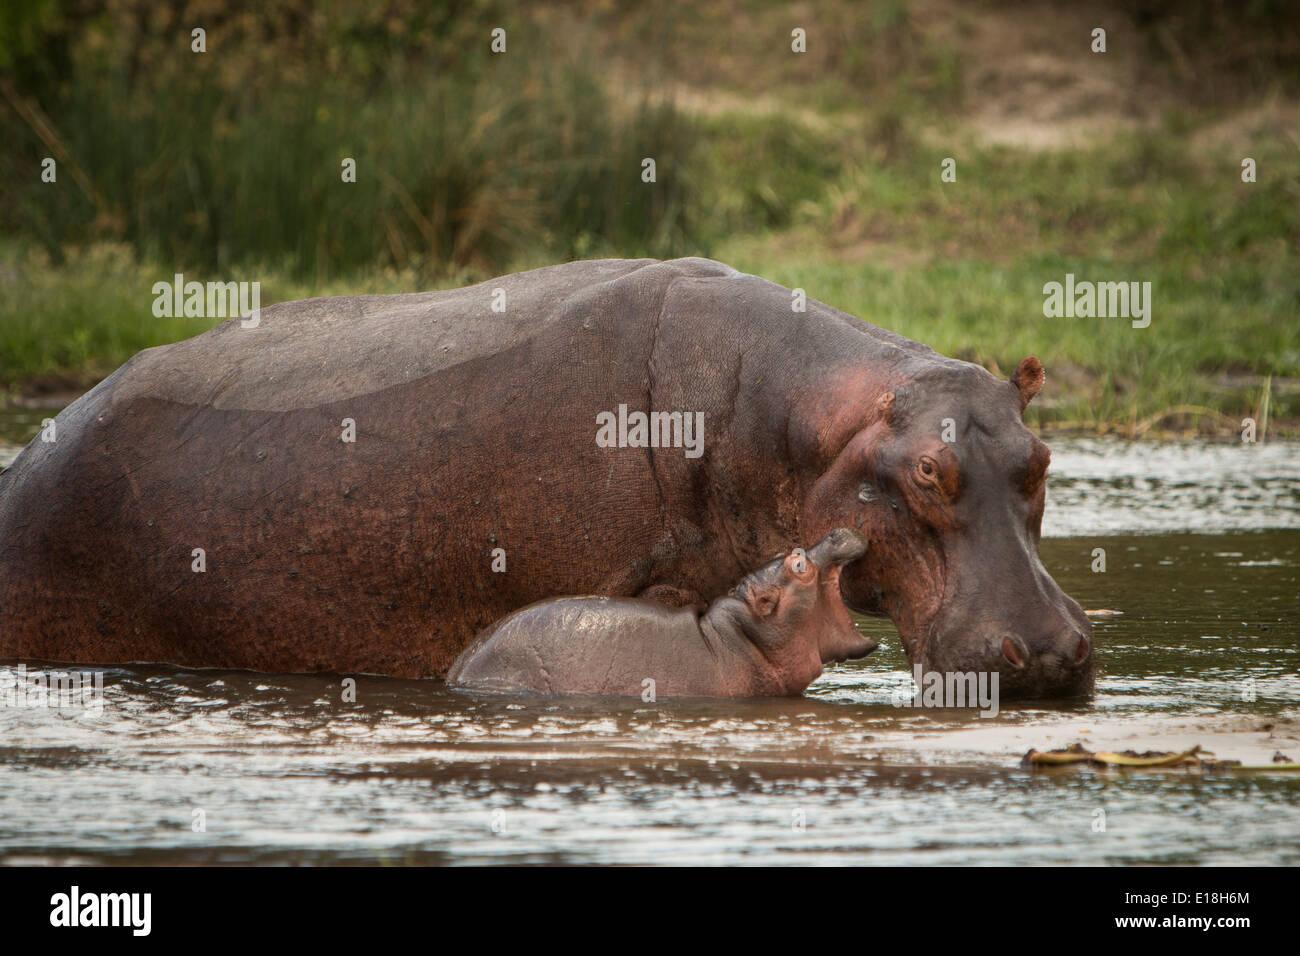 Hippopotamus at Murchison Falls National Park, Uganda, East Africa. - Stock Image